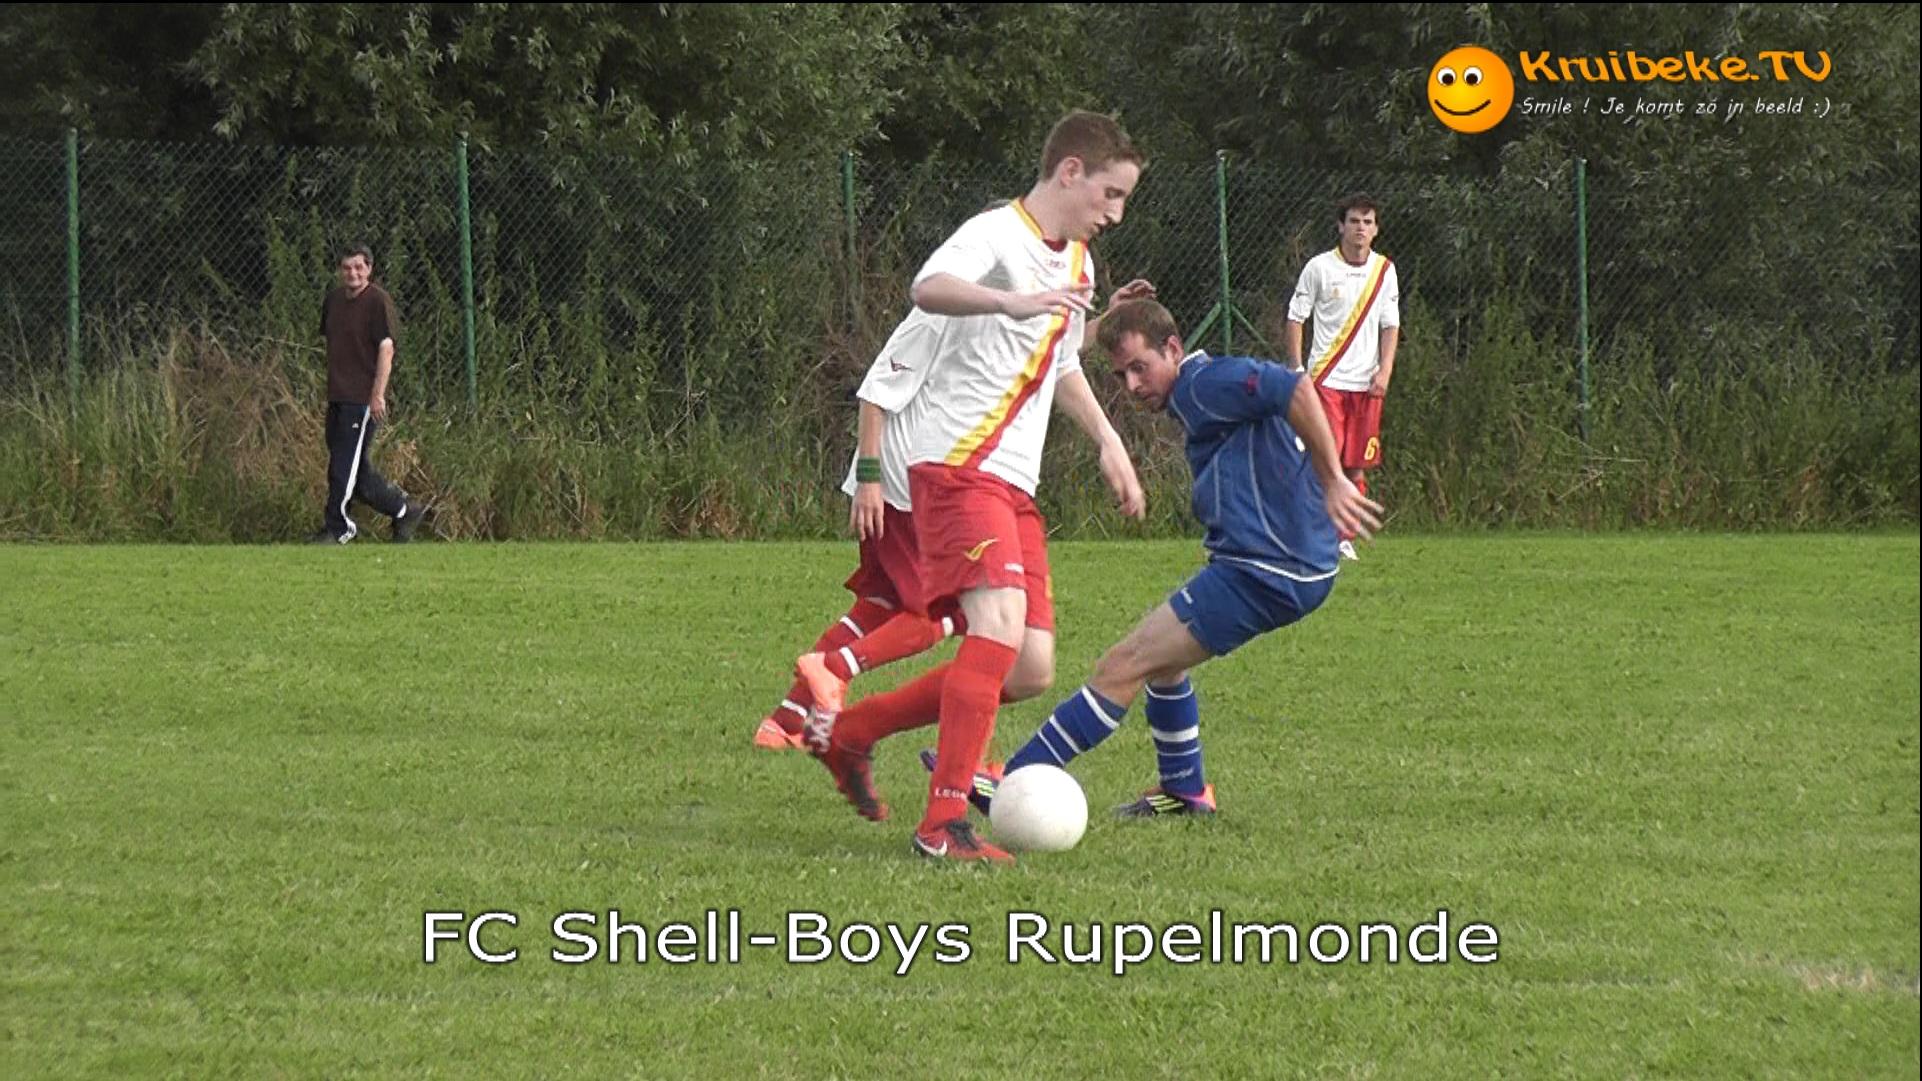 FC Shell-Boys Rupelmonde